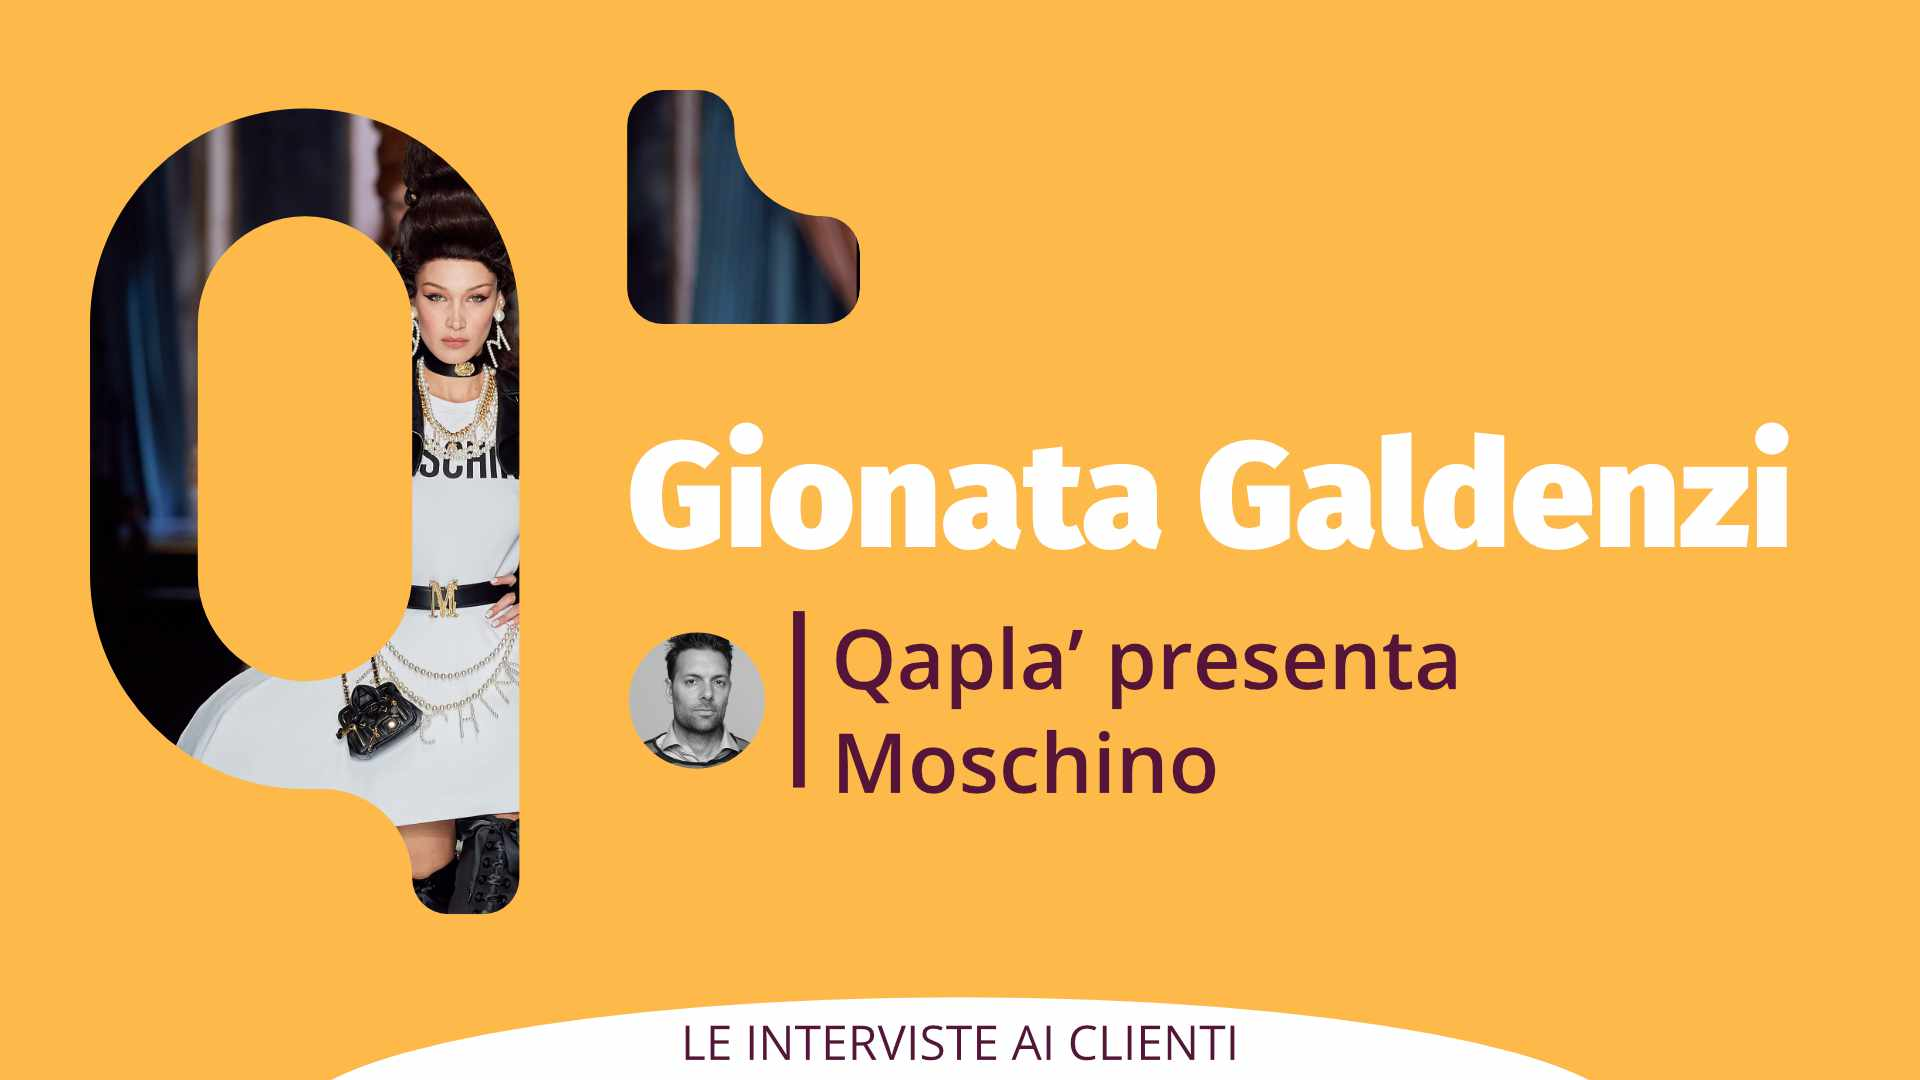 Intervista Moschino